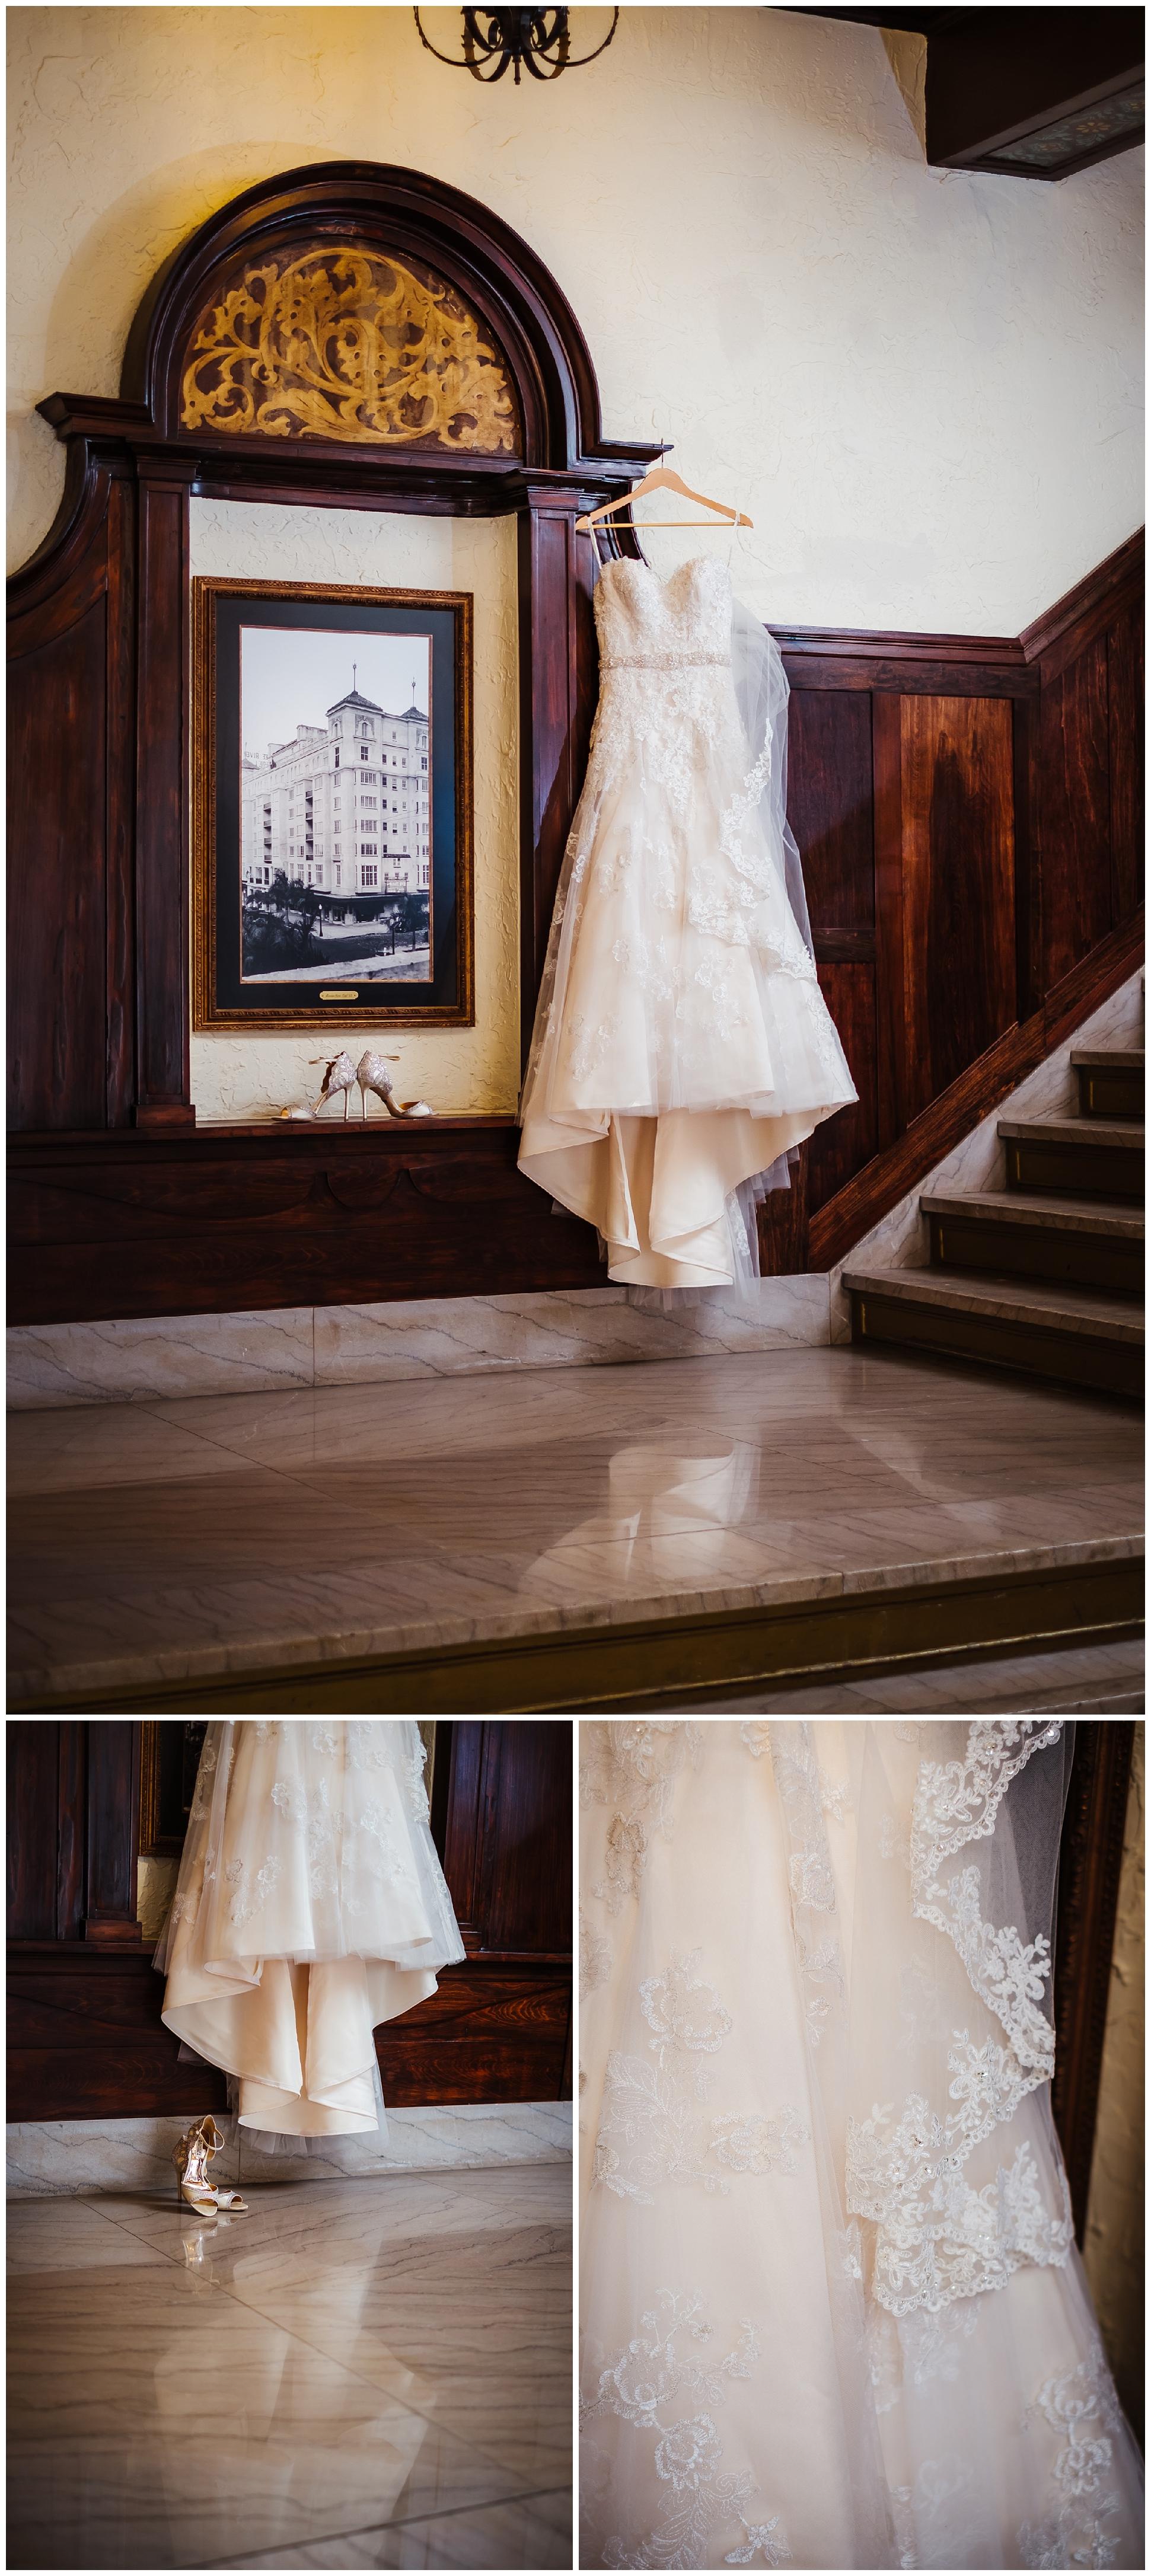 tampa-bradenton-wedding-photographer-south-florida-museum-classic-blush-gold-alpacas-sparklers_0001.jpg